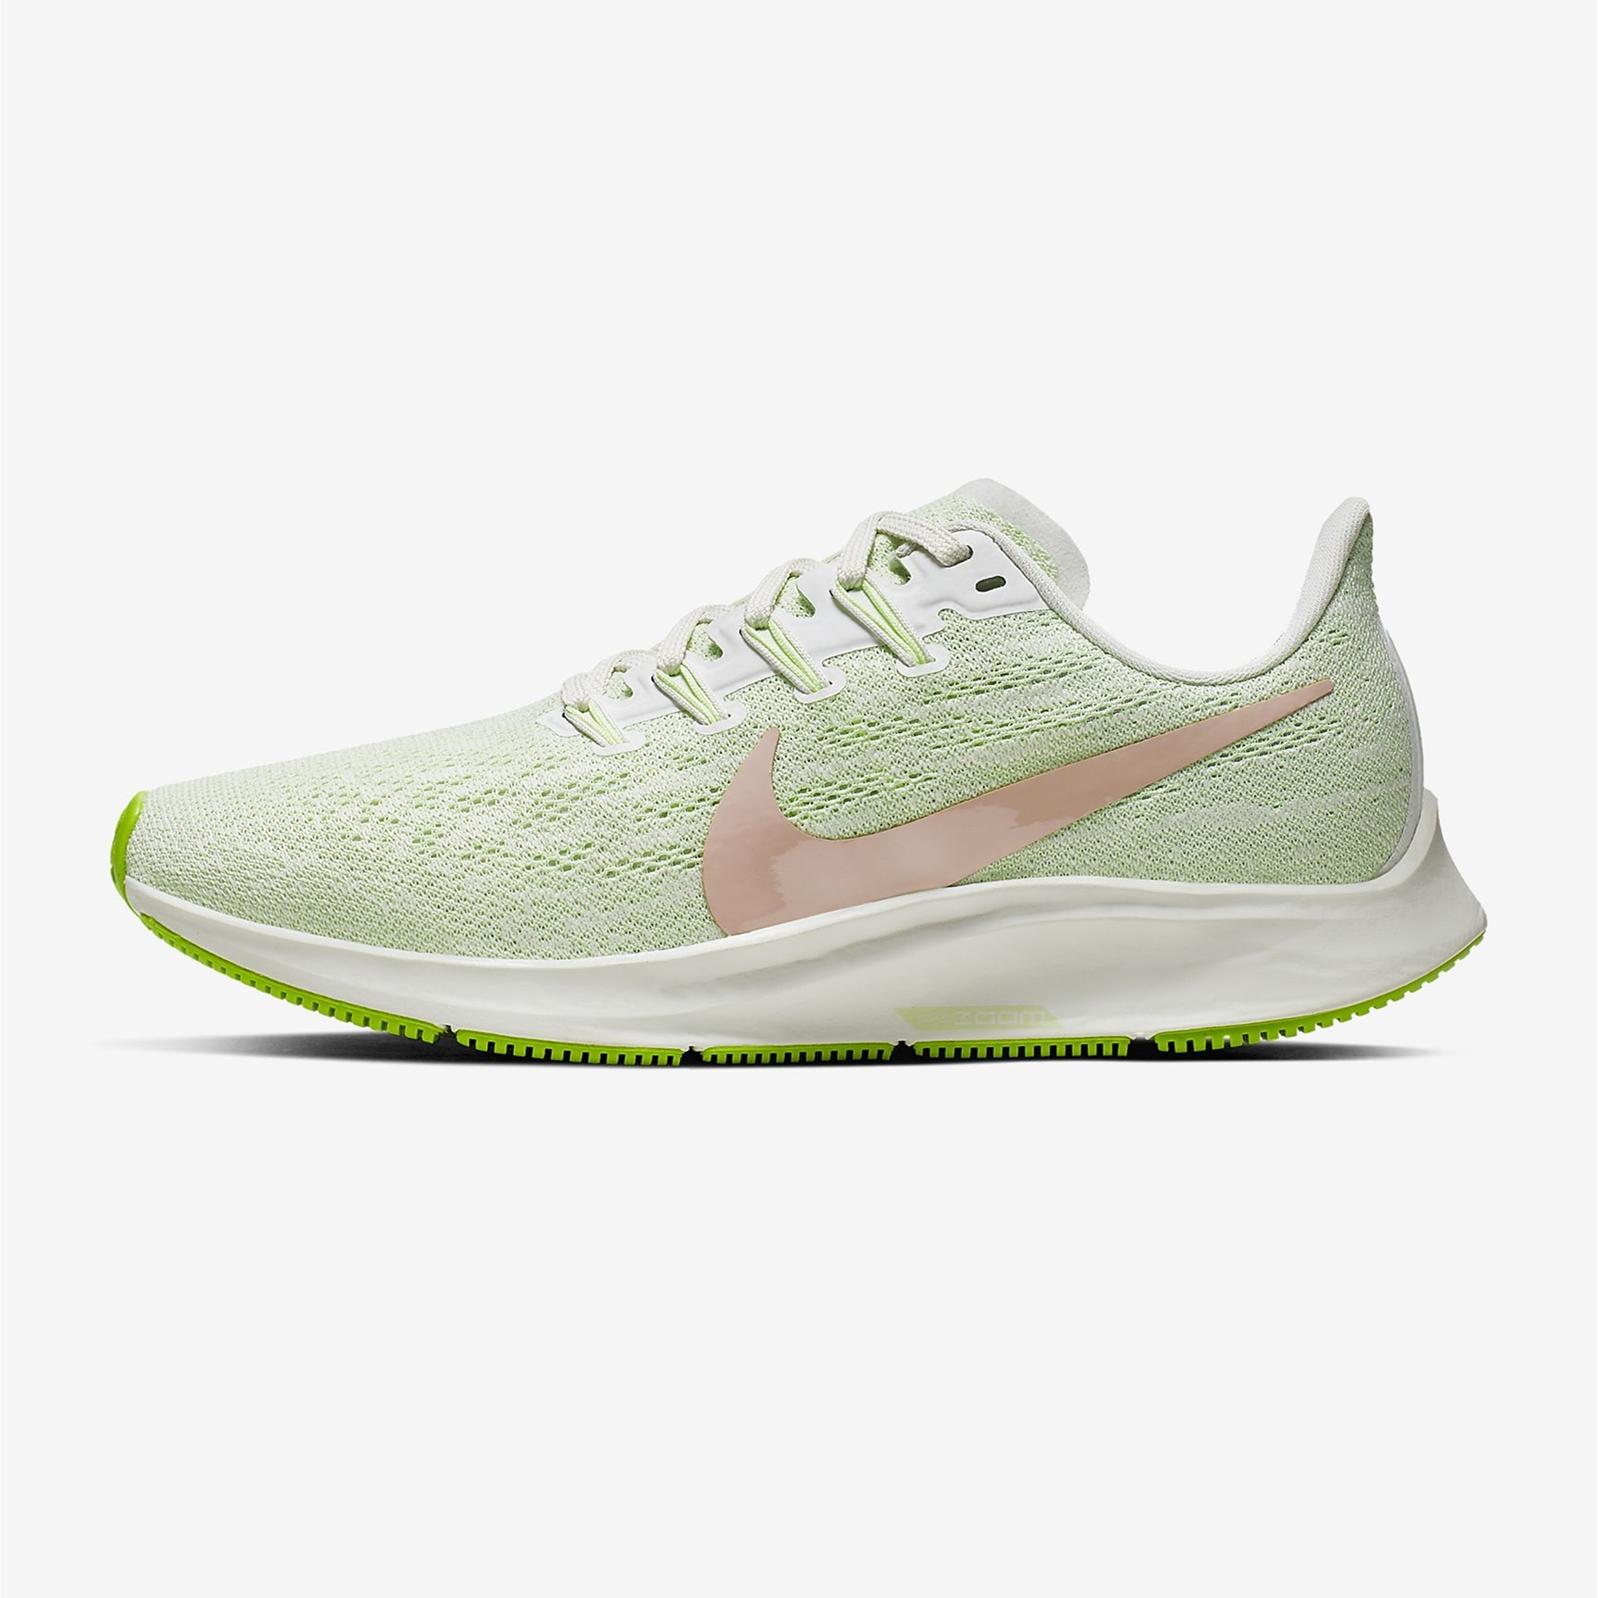 Nike 耐克 Air Zoom Pegasus 36 綠色女子跑步鞋